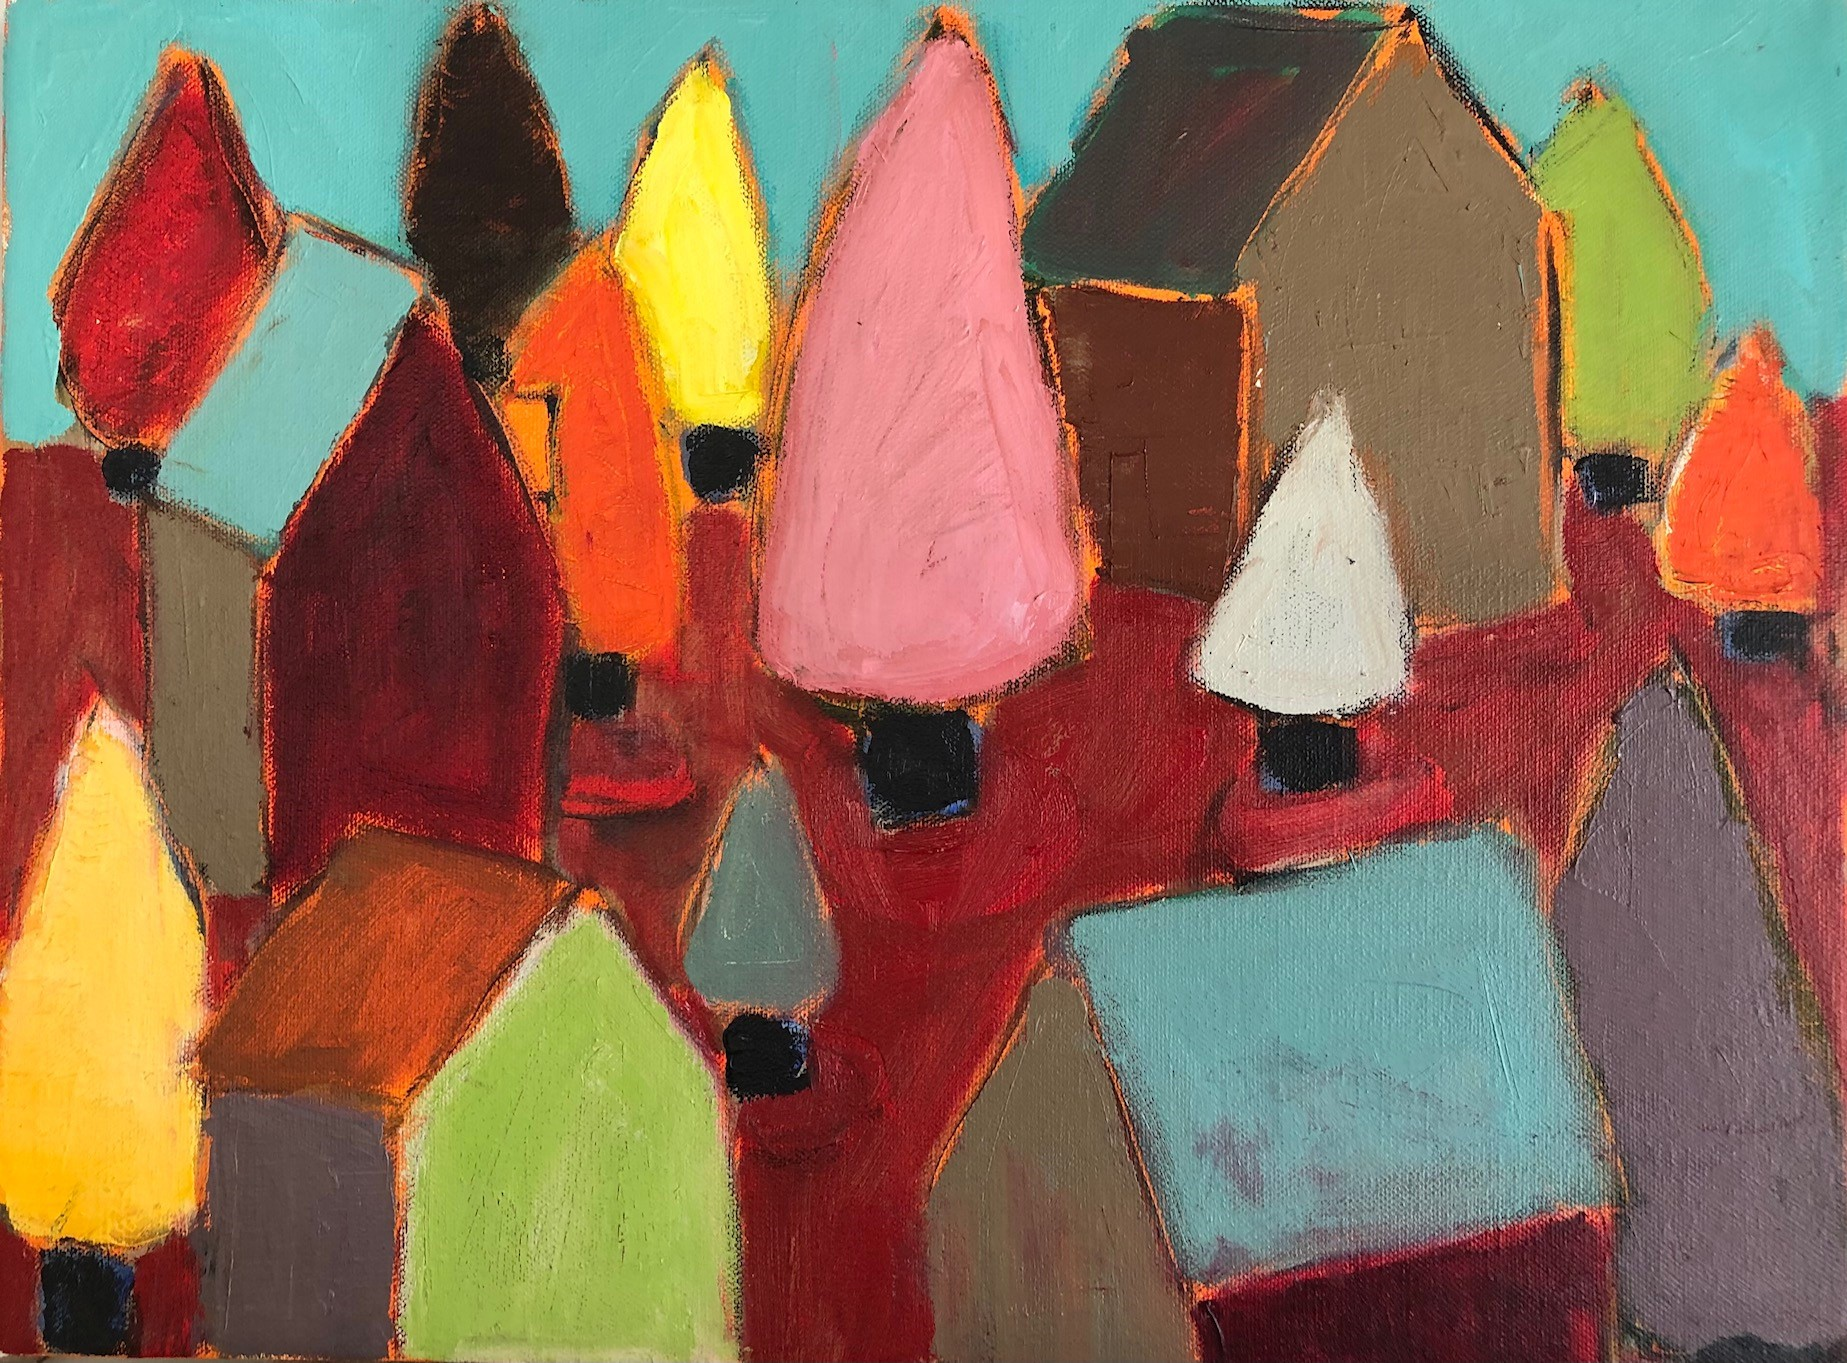 "Woodlot 12"" x 16"", Oil on canvas $300"